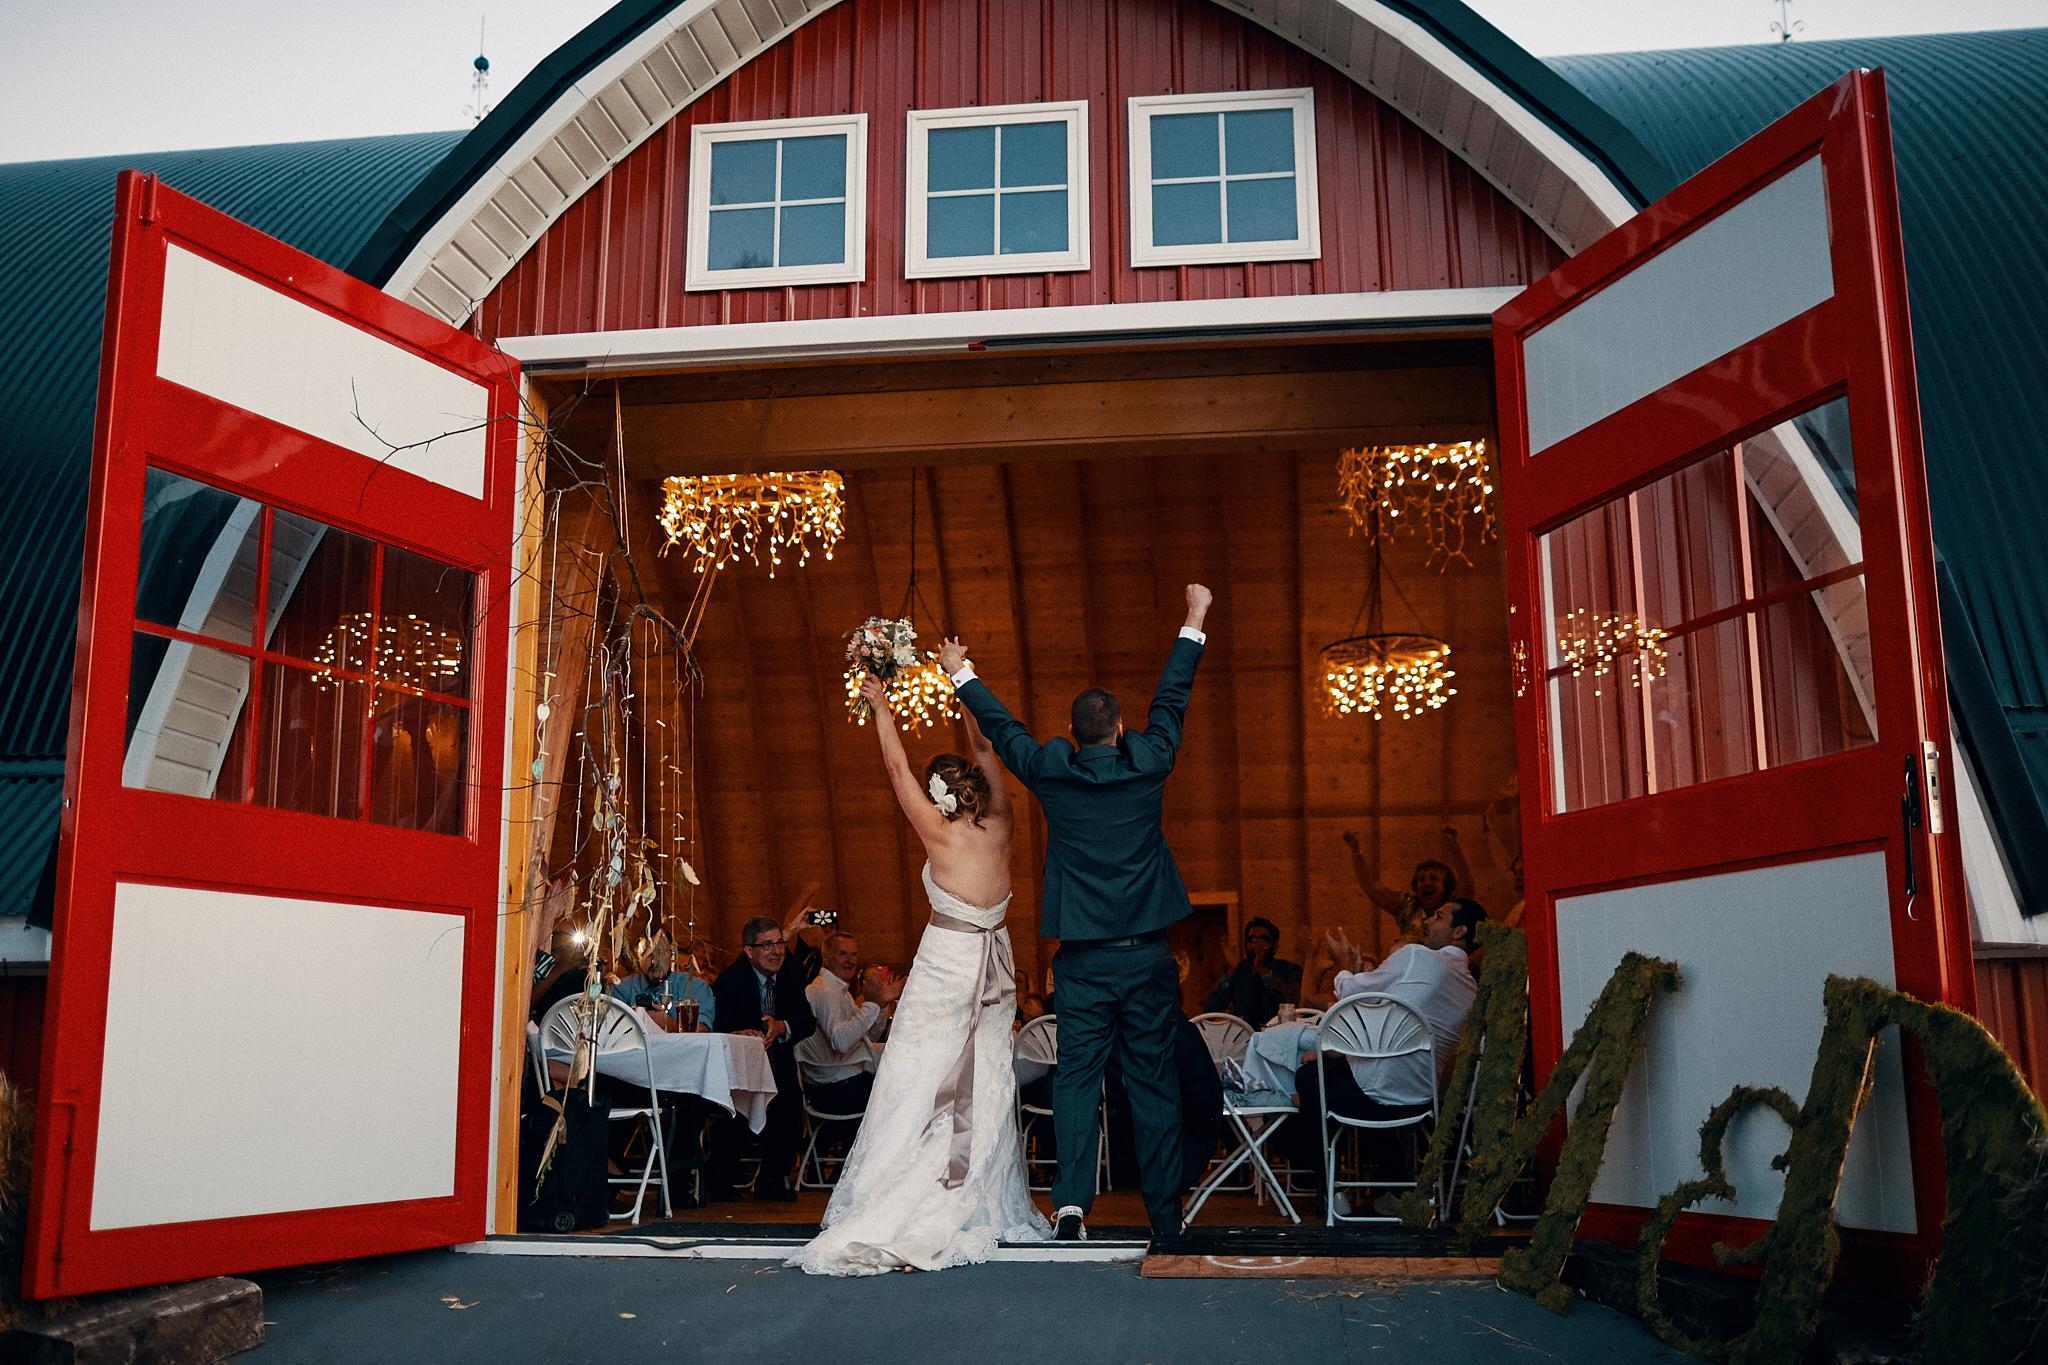 Jean_Acres_Barn_Wedding_Photography_High_End_Minneapolis_Brand_Photographer_Something_Candid_022.JPG